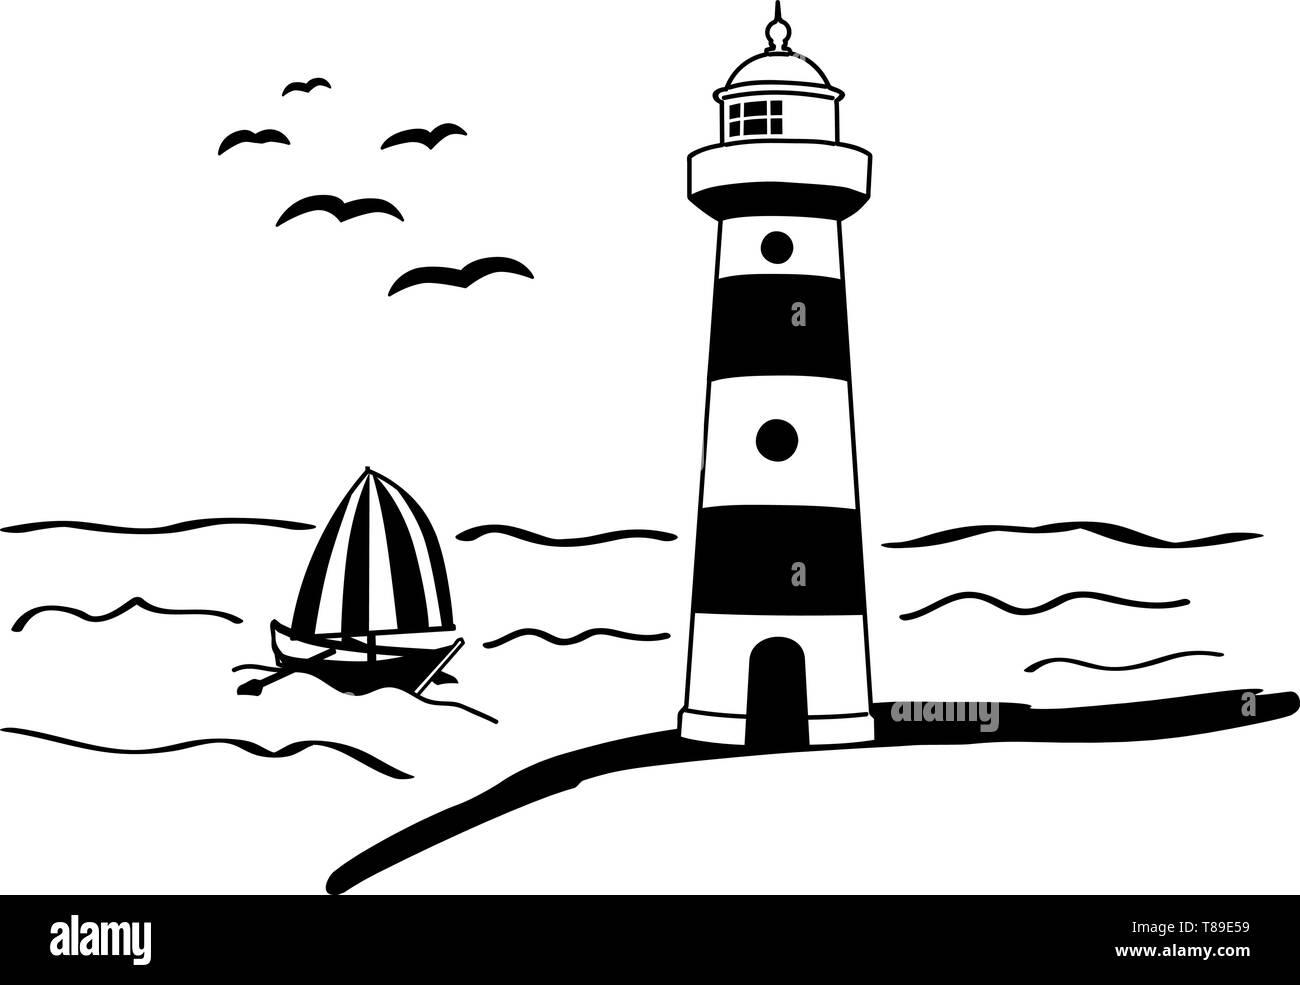 wall decal lighthouse shine light sea maritime boat ship sailboat - Stock Vector